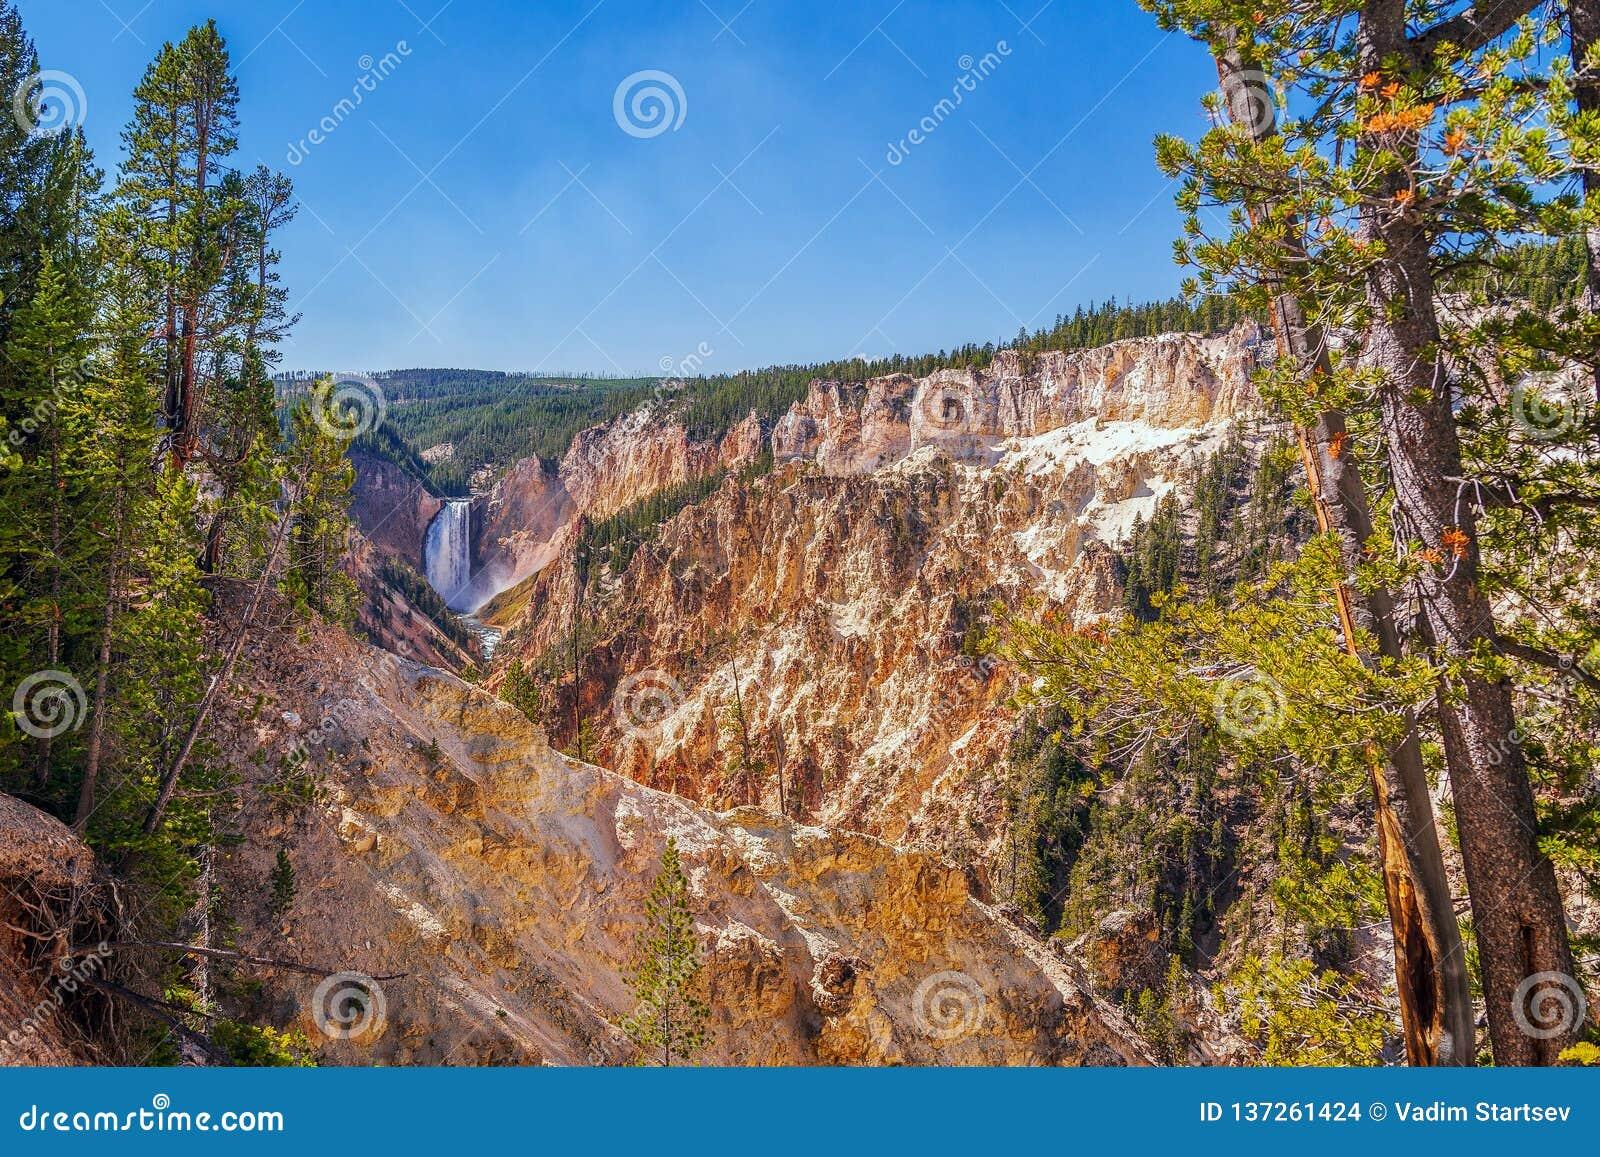 Взгляд гранд-каньона Йеллоустон от следа пункта художника Национальный парк Йеллоустона Вайоминг США